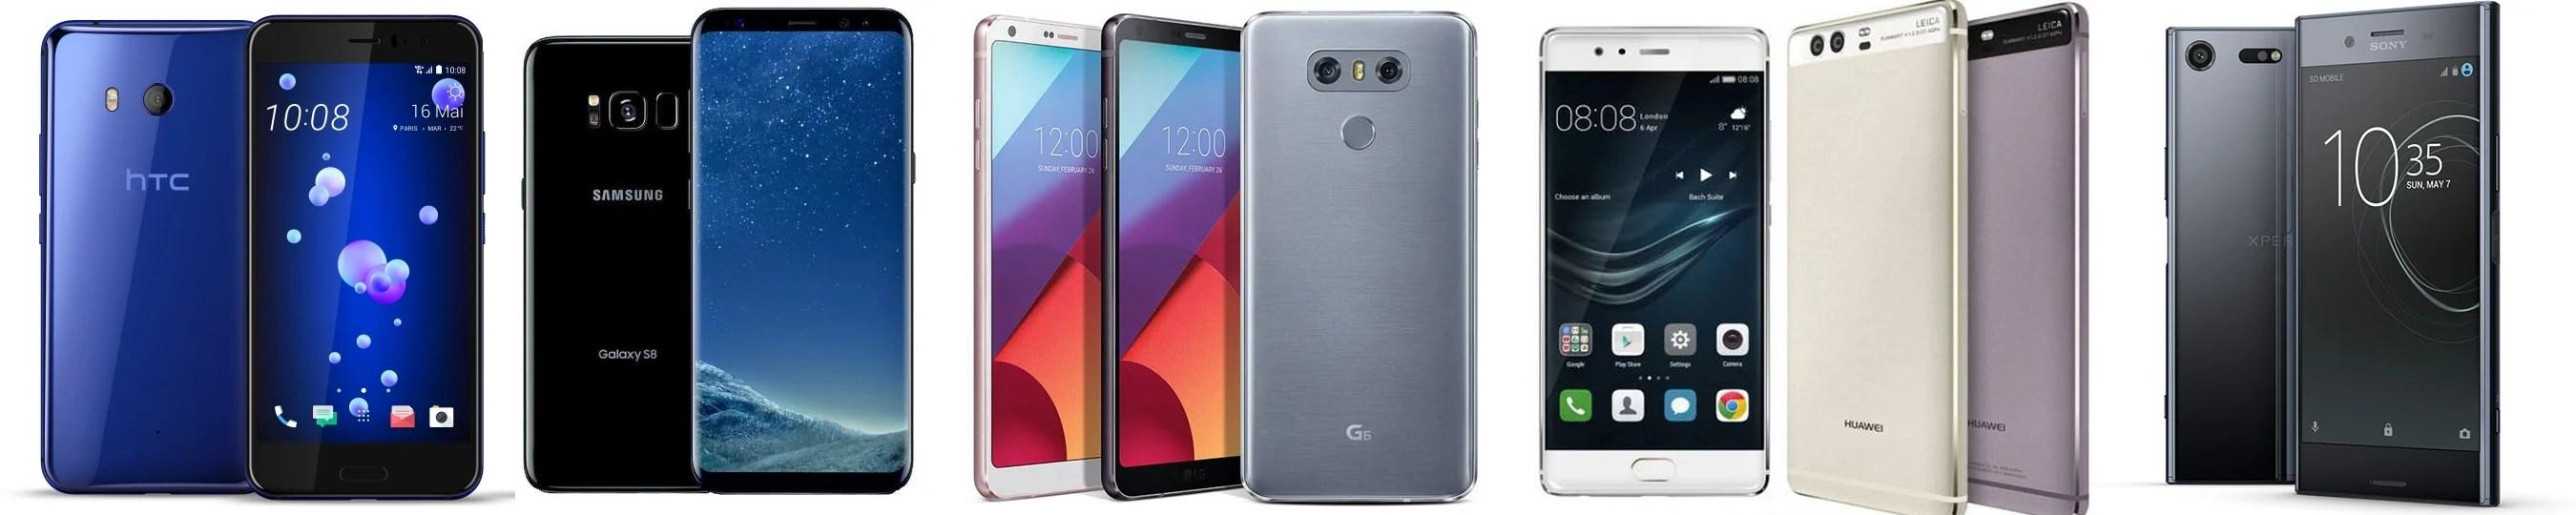 Comparatif : HTC U11 vs Samsung Galaxy S8 vs Huawei P10 vs LG G6 vs Sony Xperia XZ Premium